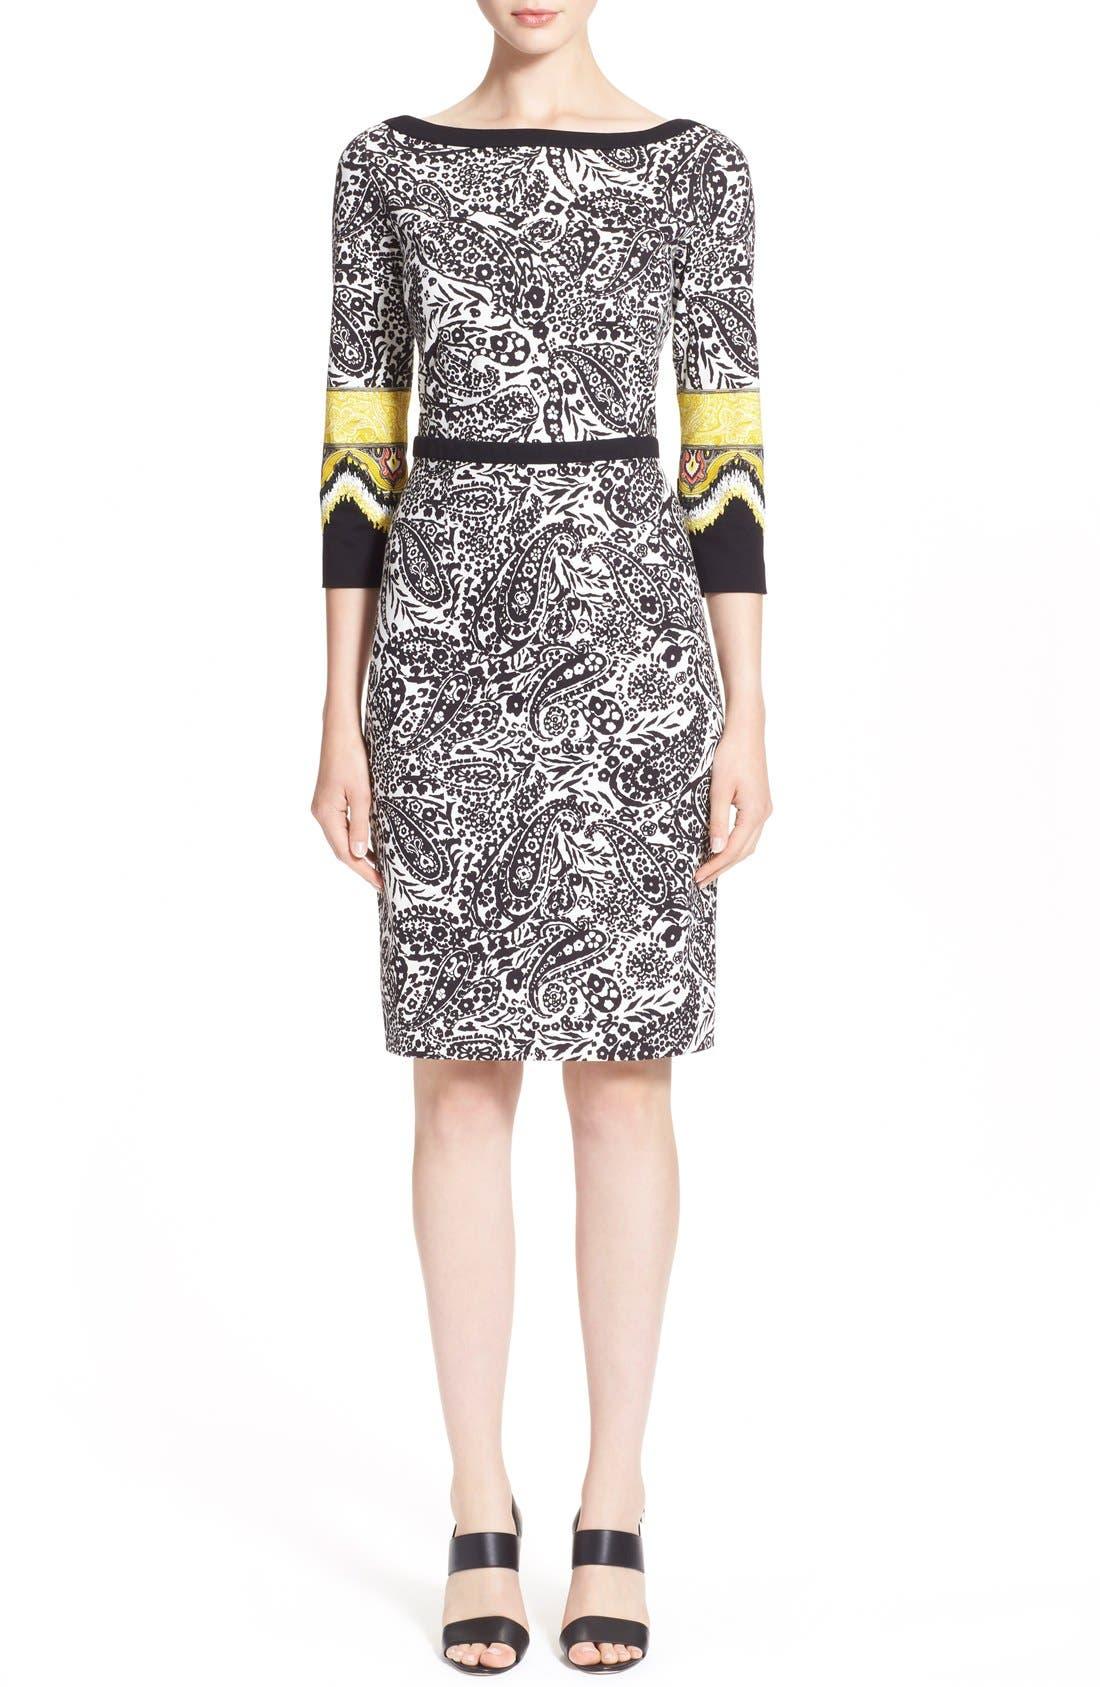 Alternate Image 1 Selected - Etro Paisley Print Stretch Jersey Dress